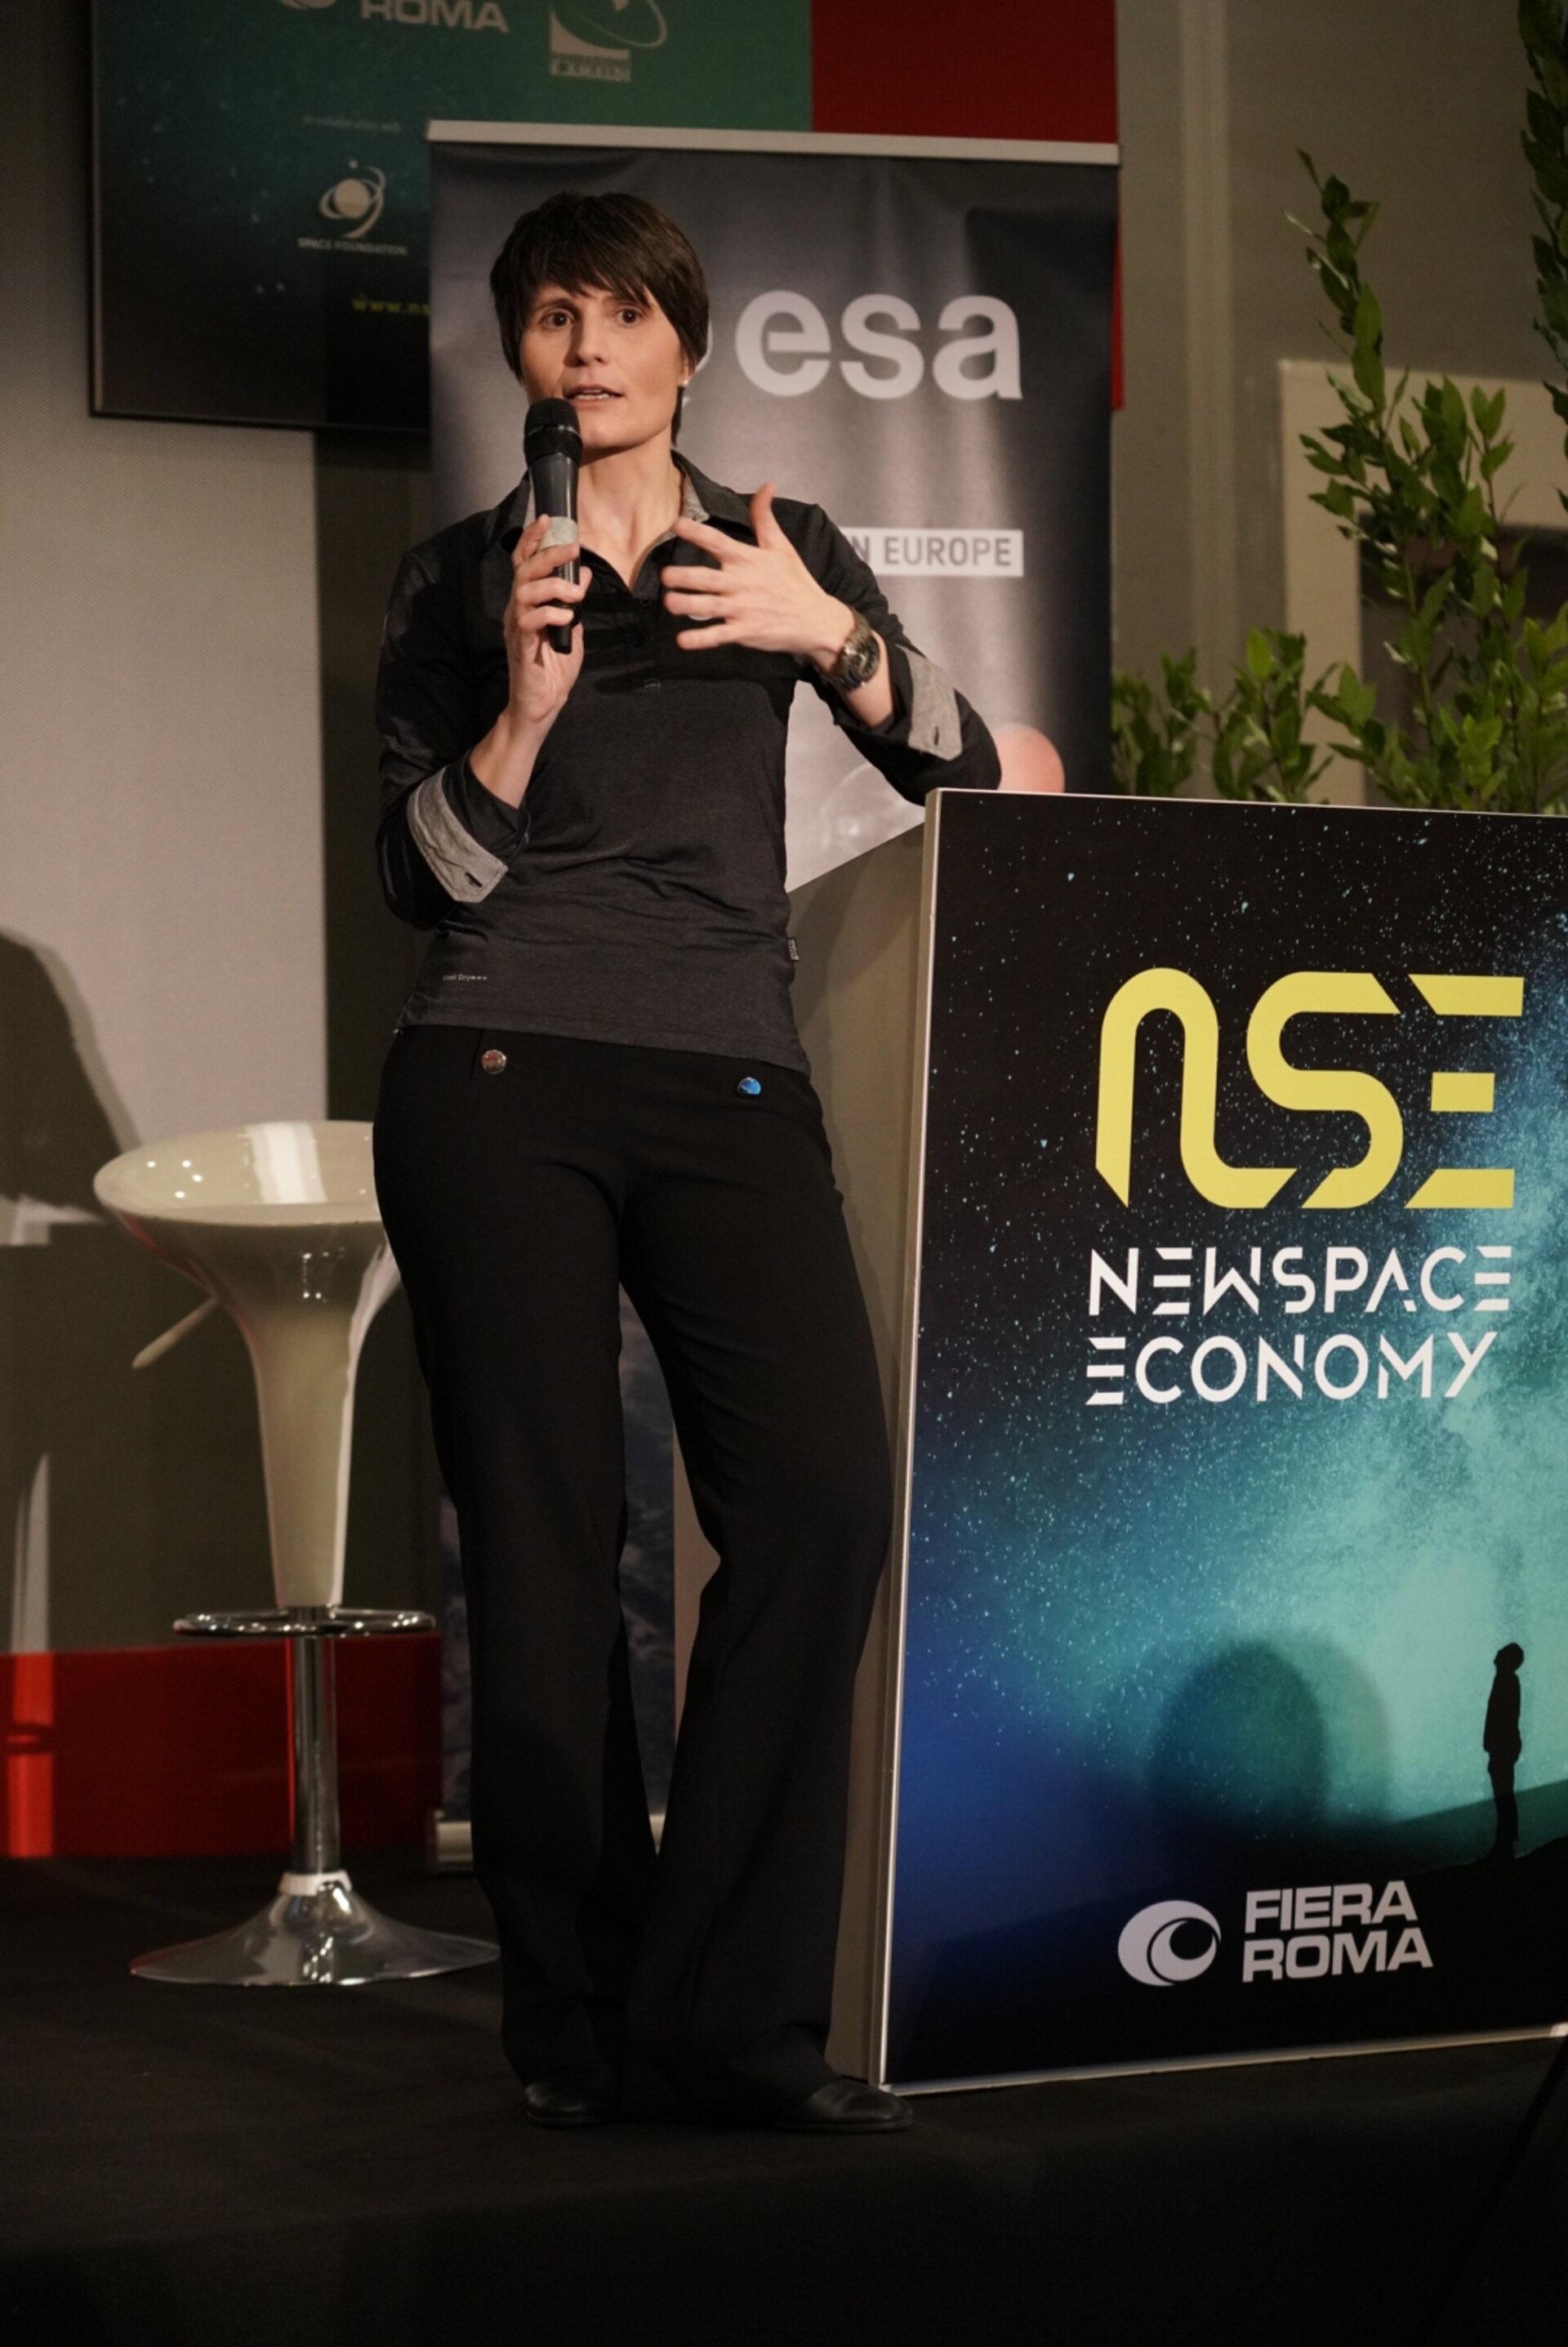 Samantha Cristoforetti, Astronaut, ESA